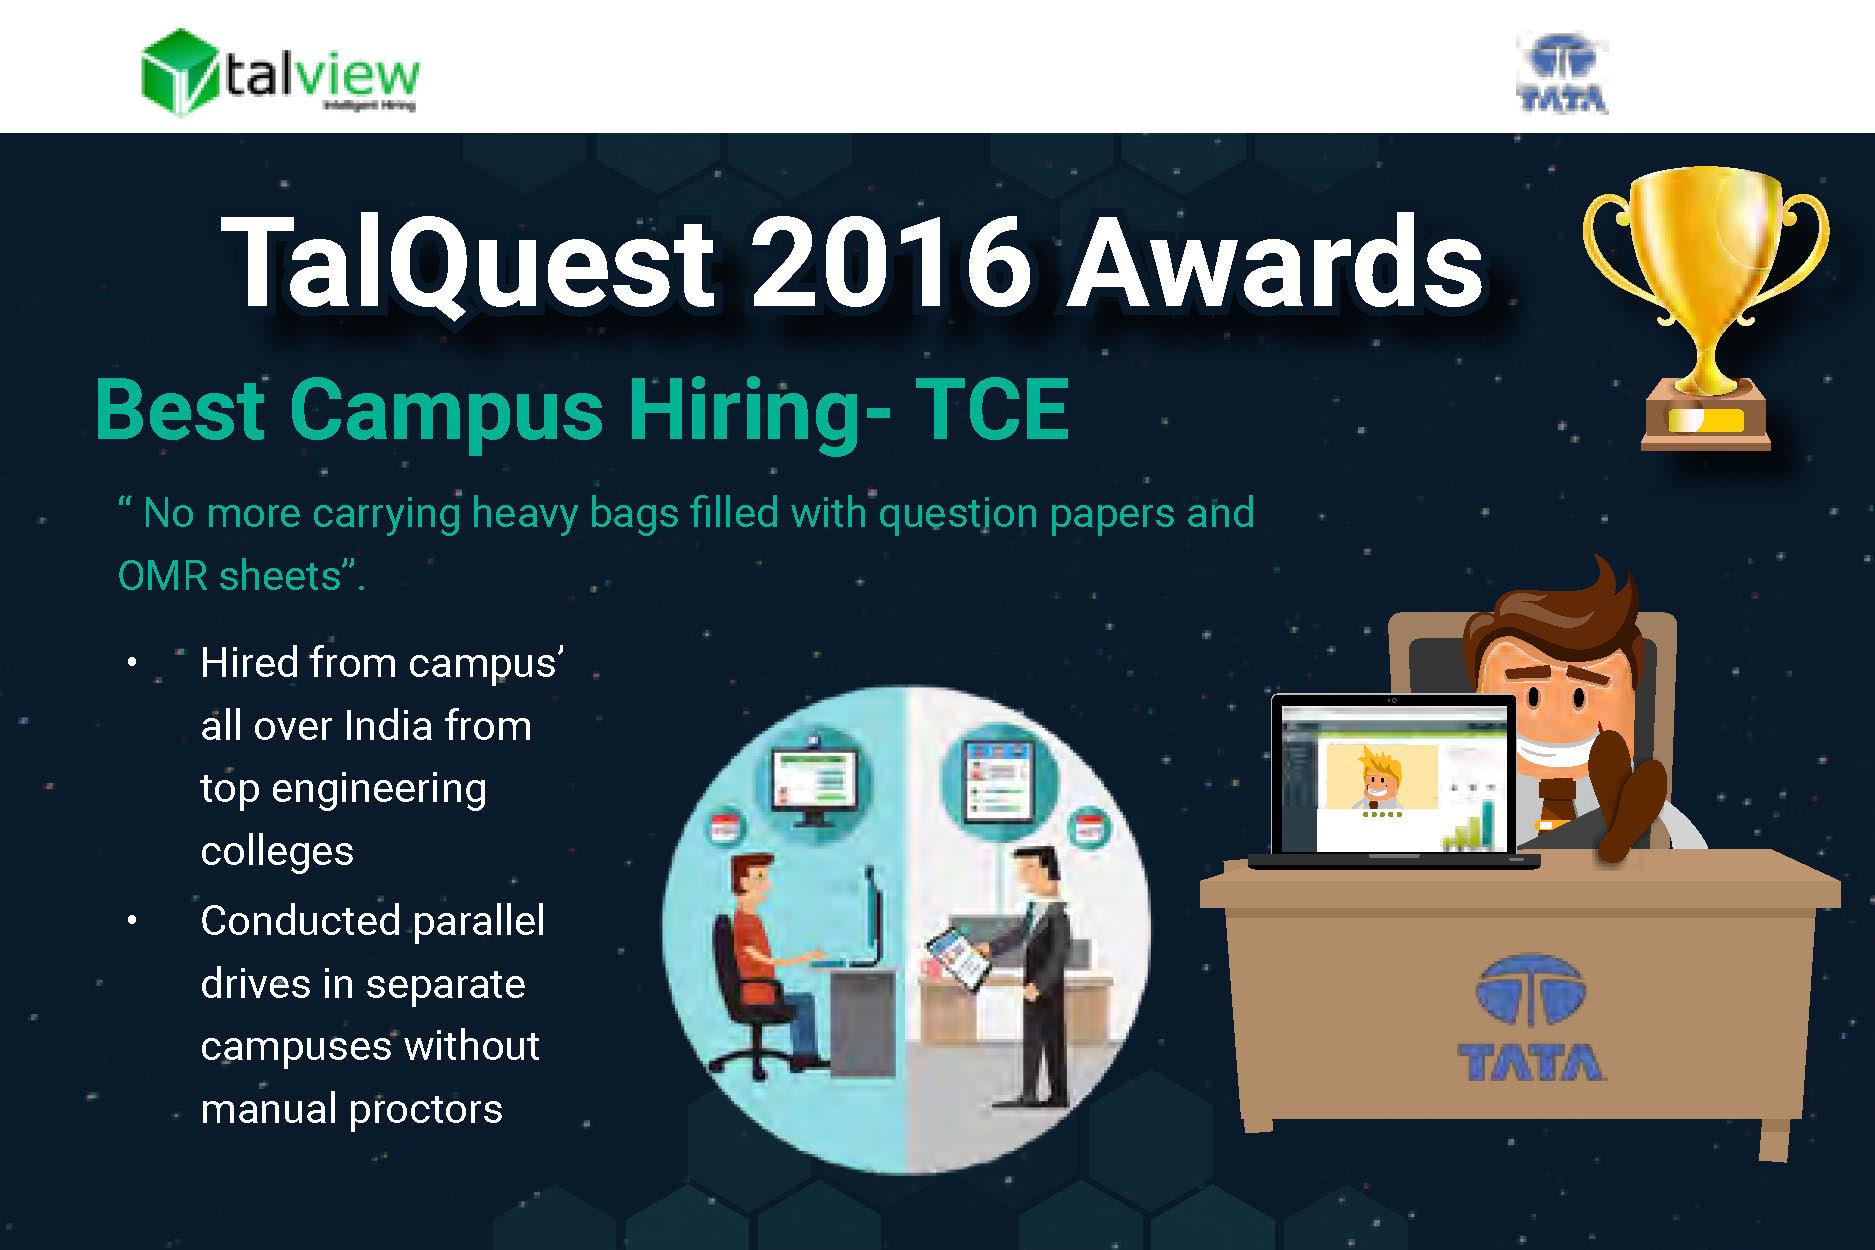 Best Campus Recruitment - TCE